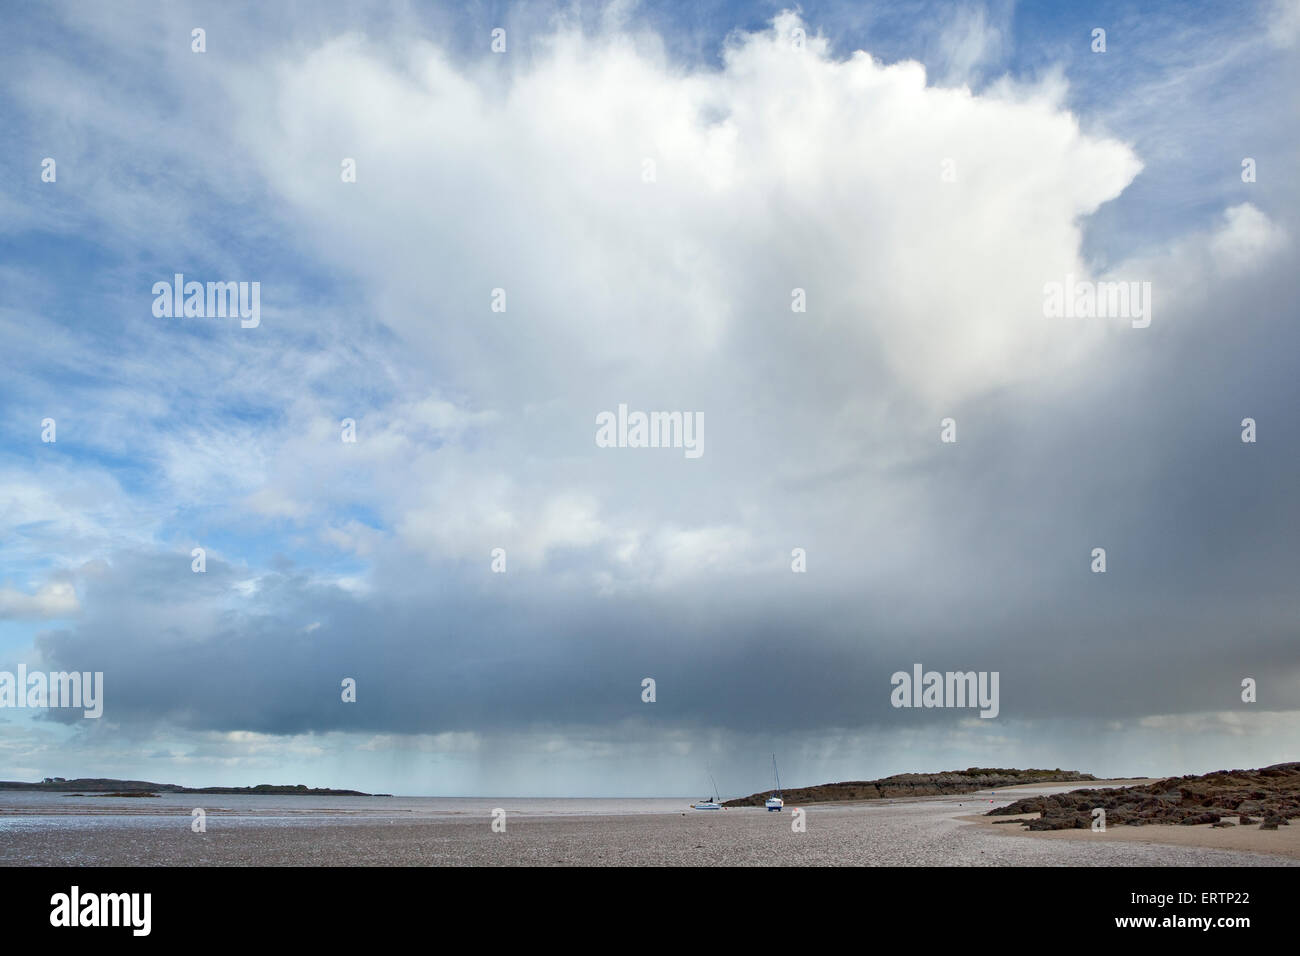 A shower cloud over the beach at Mossyard on Fleet Bay near Gatehouse of Fleet, Dumfries and Galloway, Scotland - Stock Image